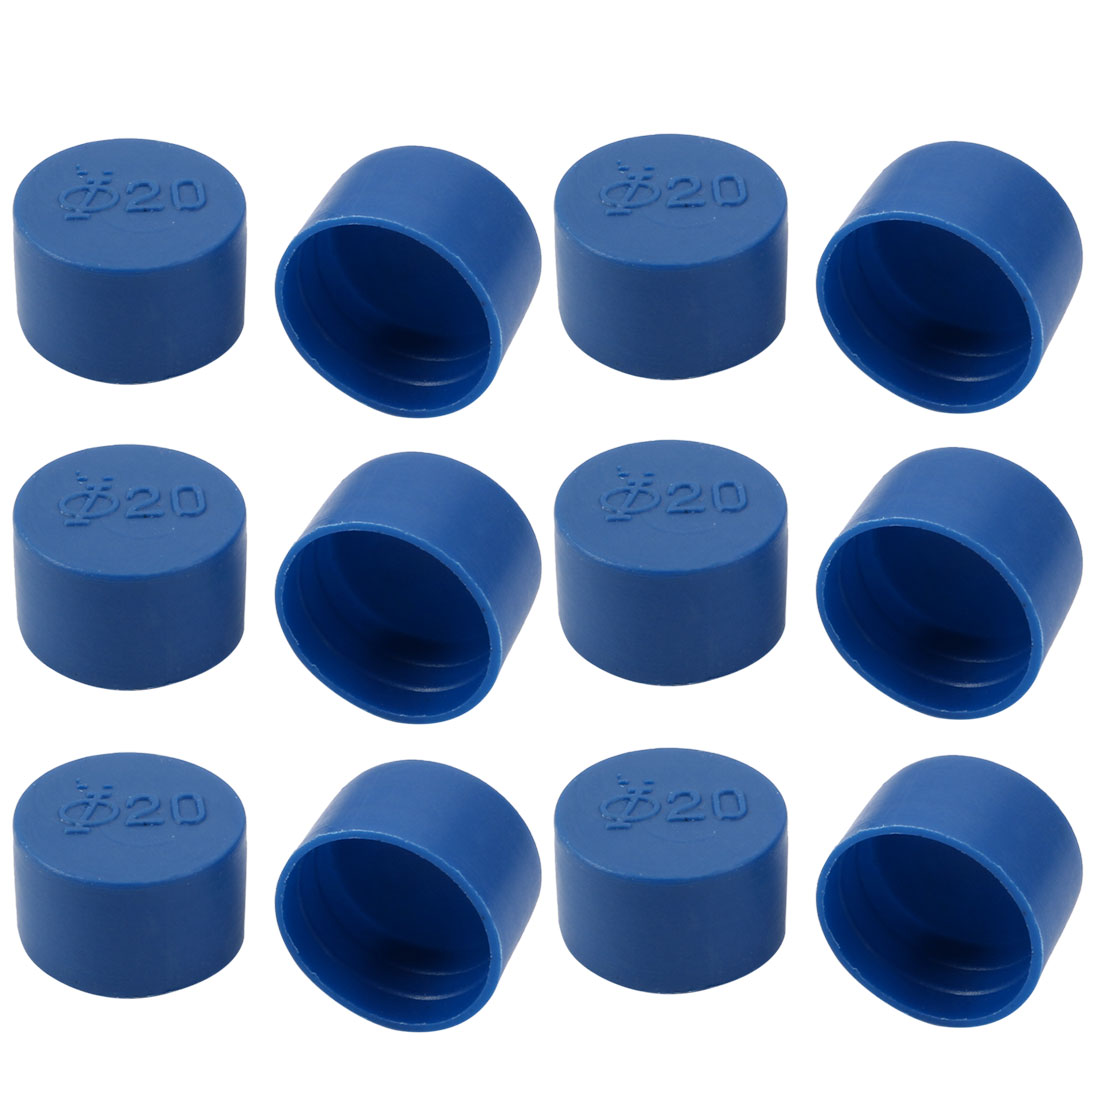 12pcs 20mm Inner Dia PE Plastic End Cap Bolt Thread Protector Tube Cover Blue